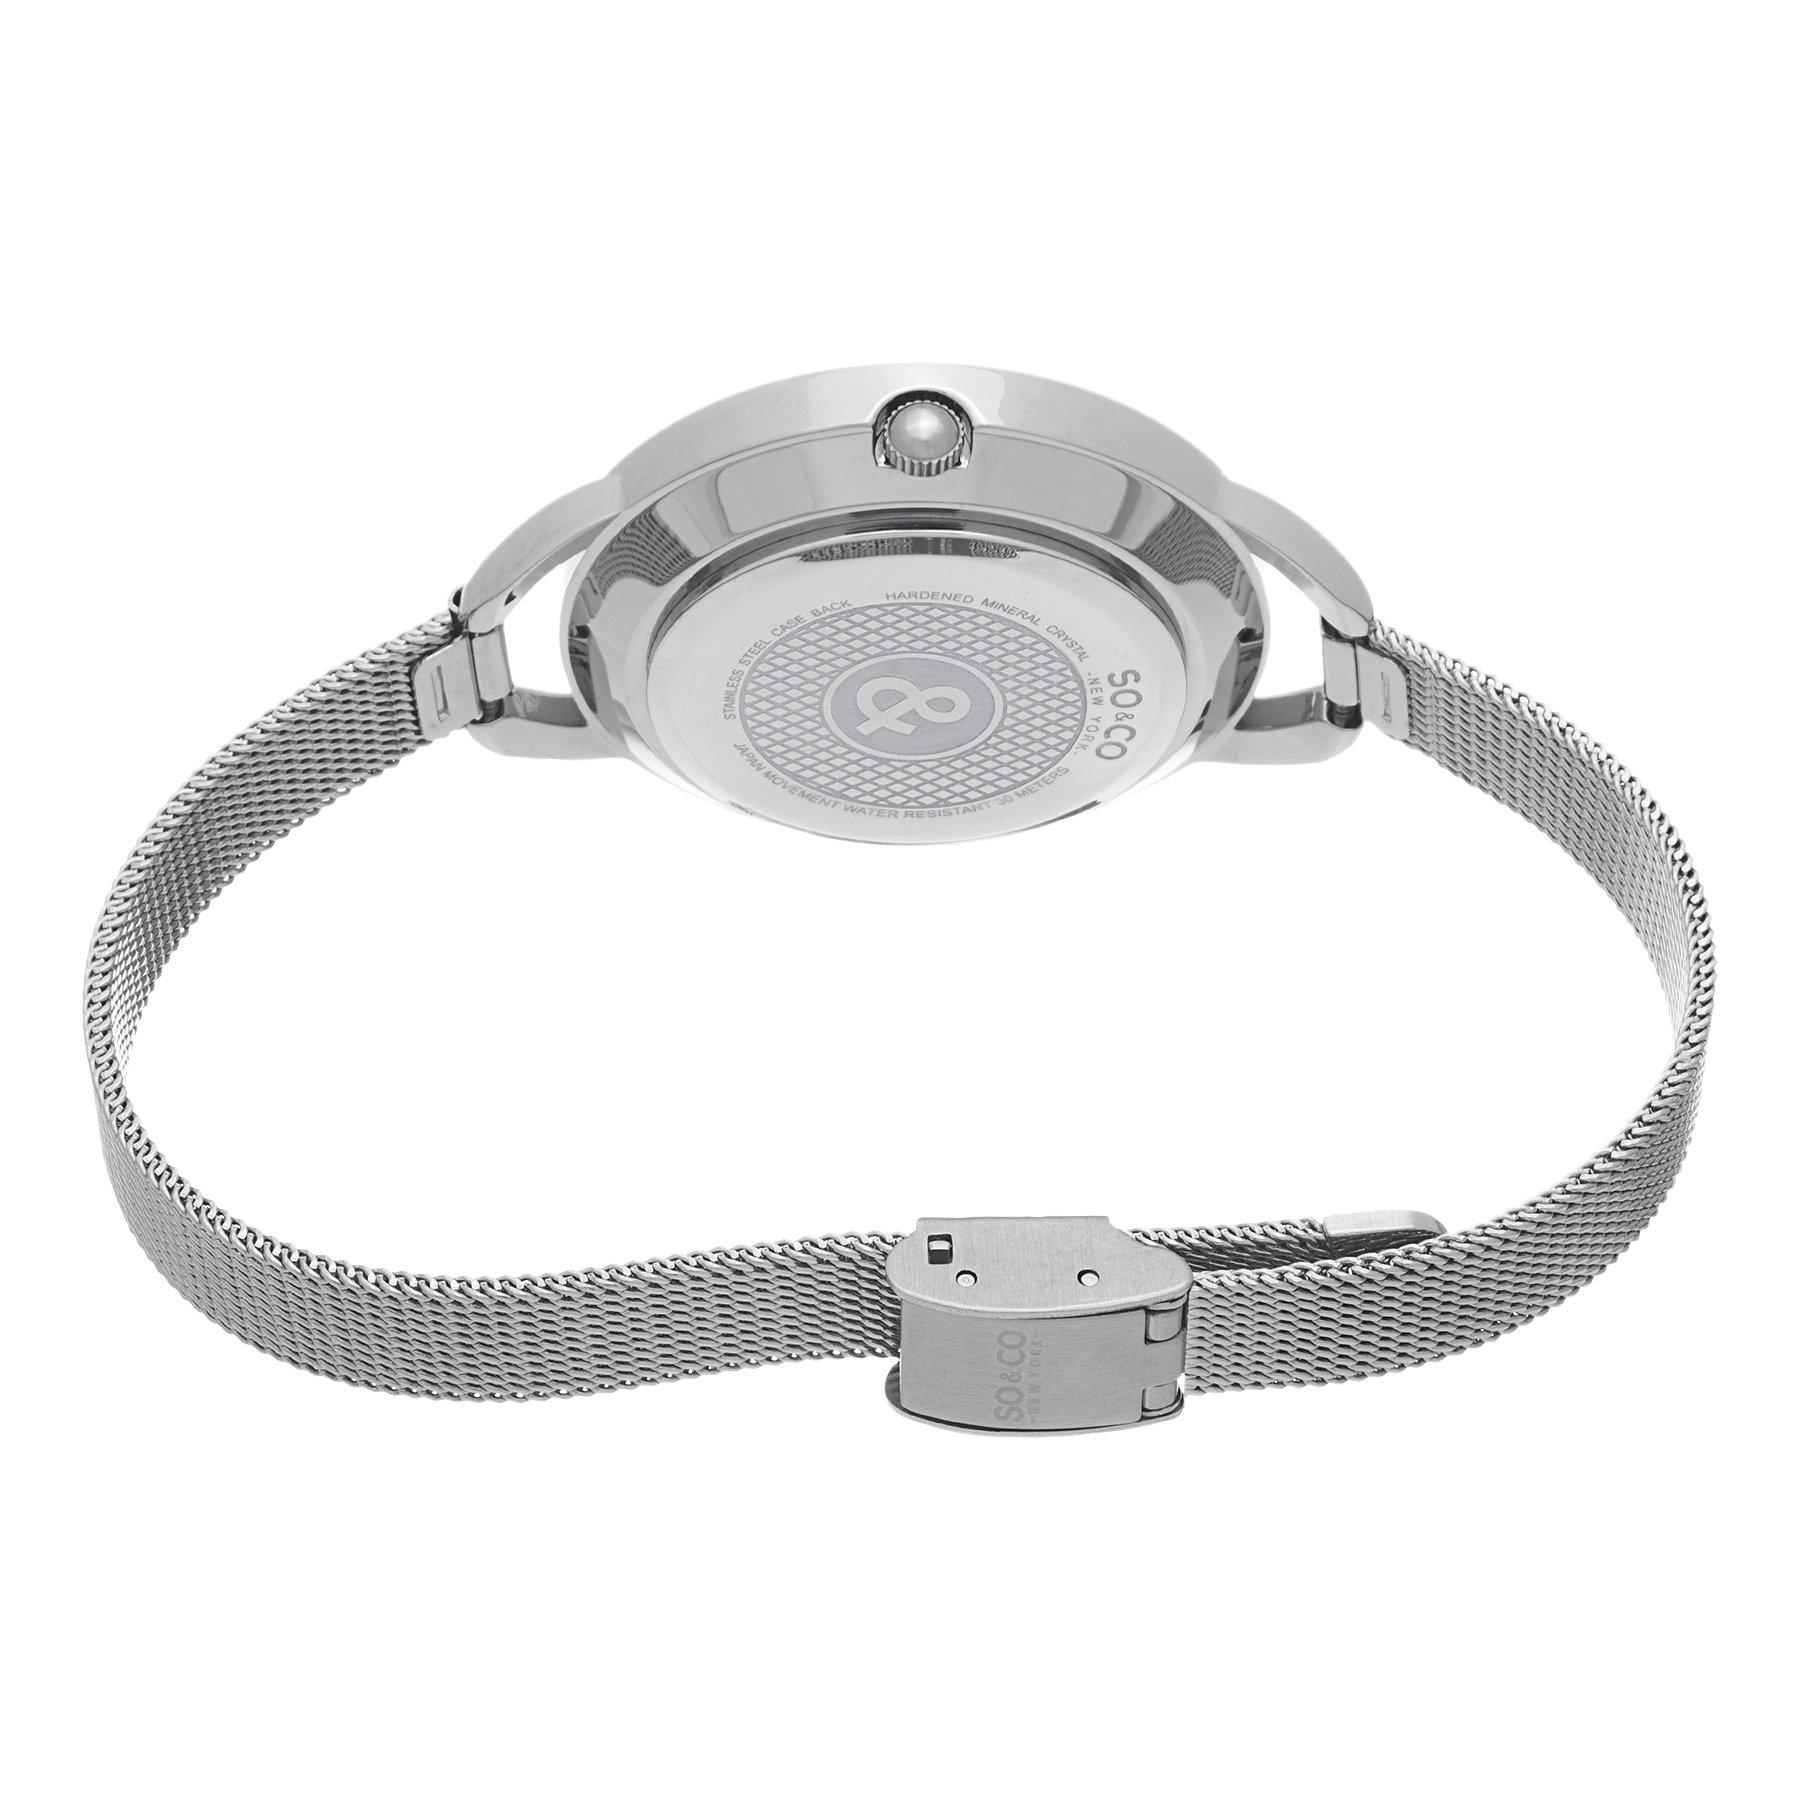 SO&CO New York Women's 5104.1 SoHo Quartz Faceted Glass and Stainless Steel Mesh Bracelet Watch